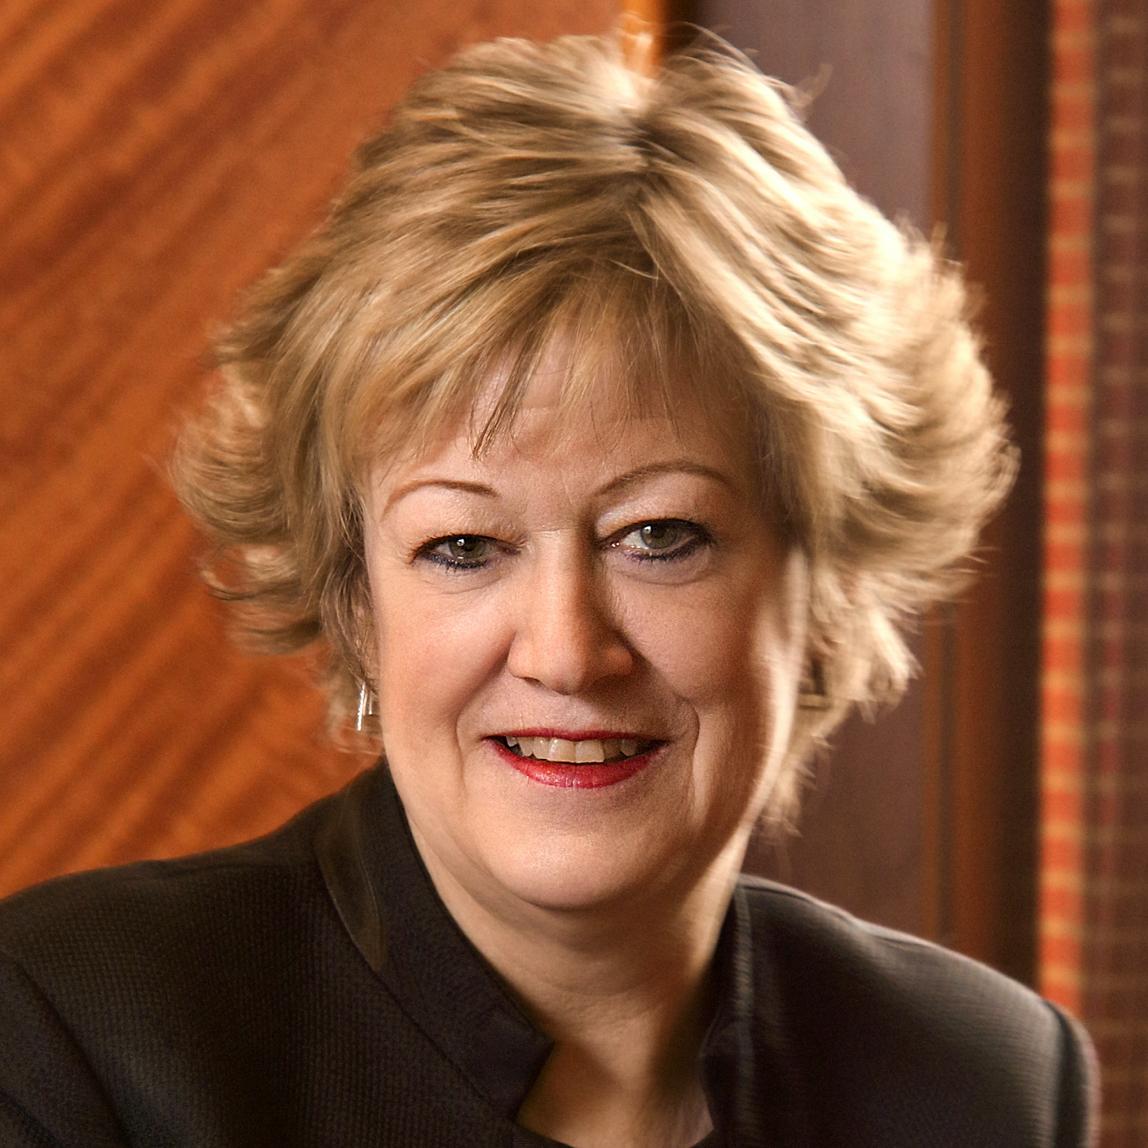 MARY ROSENDAHL - Director, Global Transaction Services